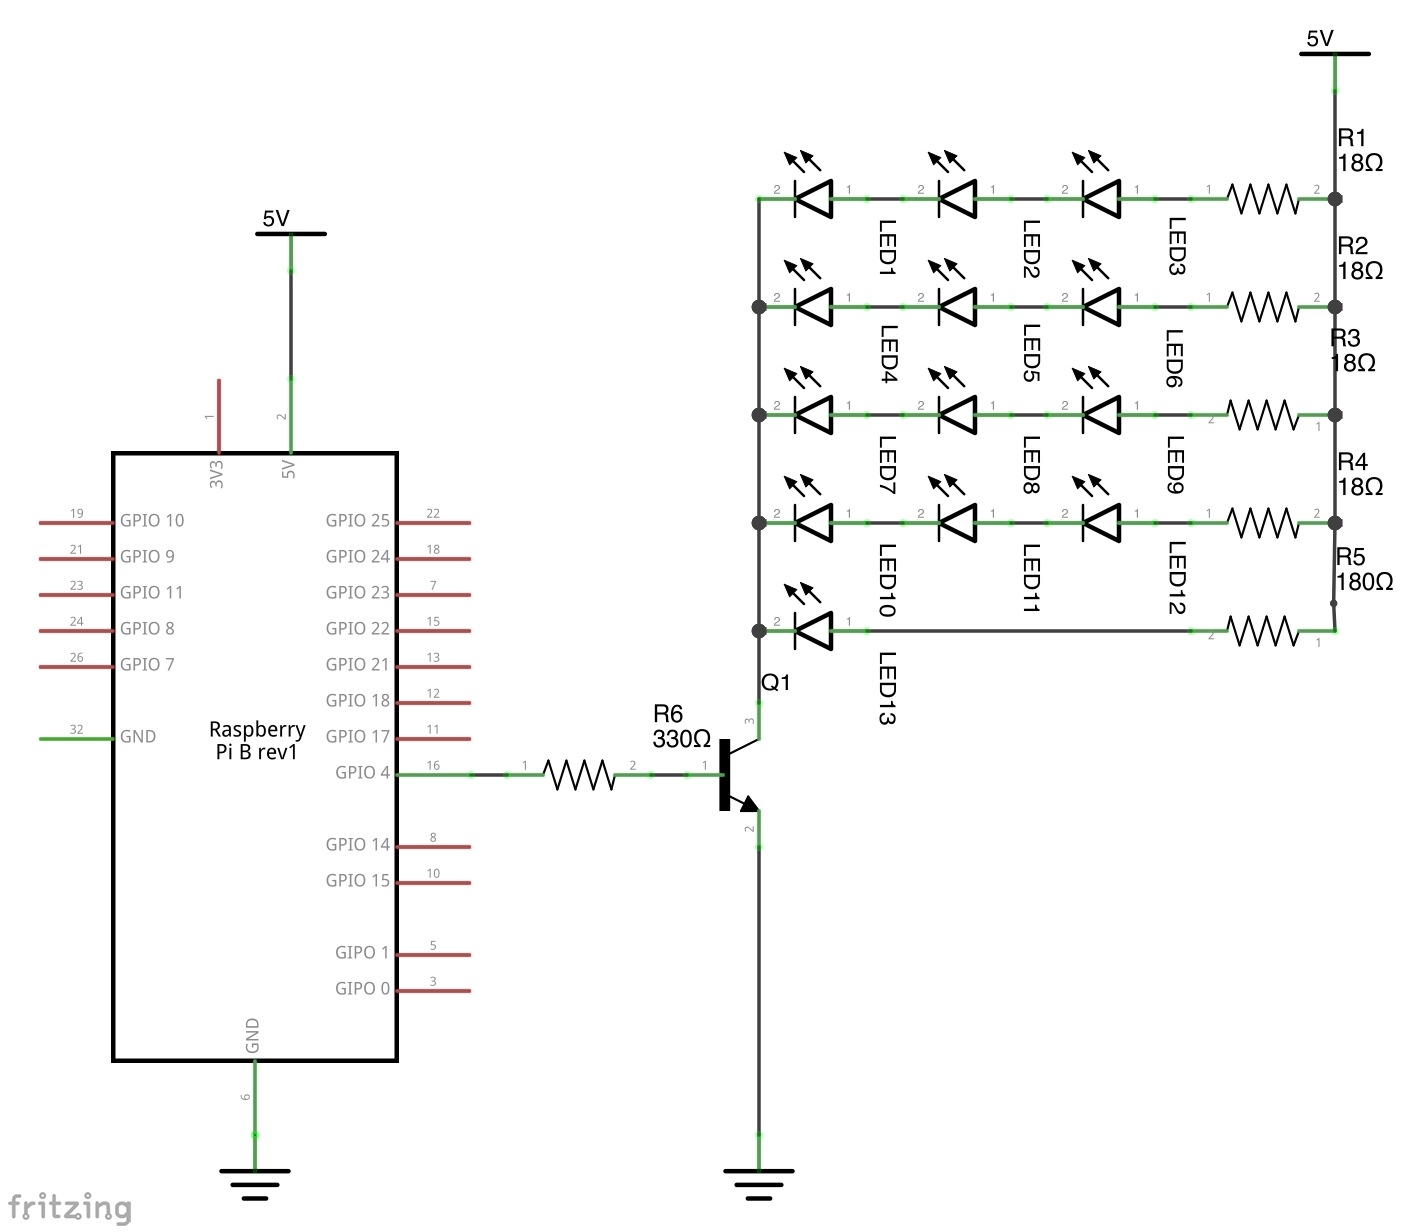 How To Use Rpi Gpio To Pwm Adjust Ir Leds Brightness